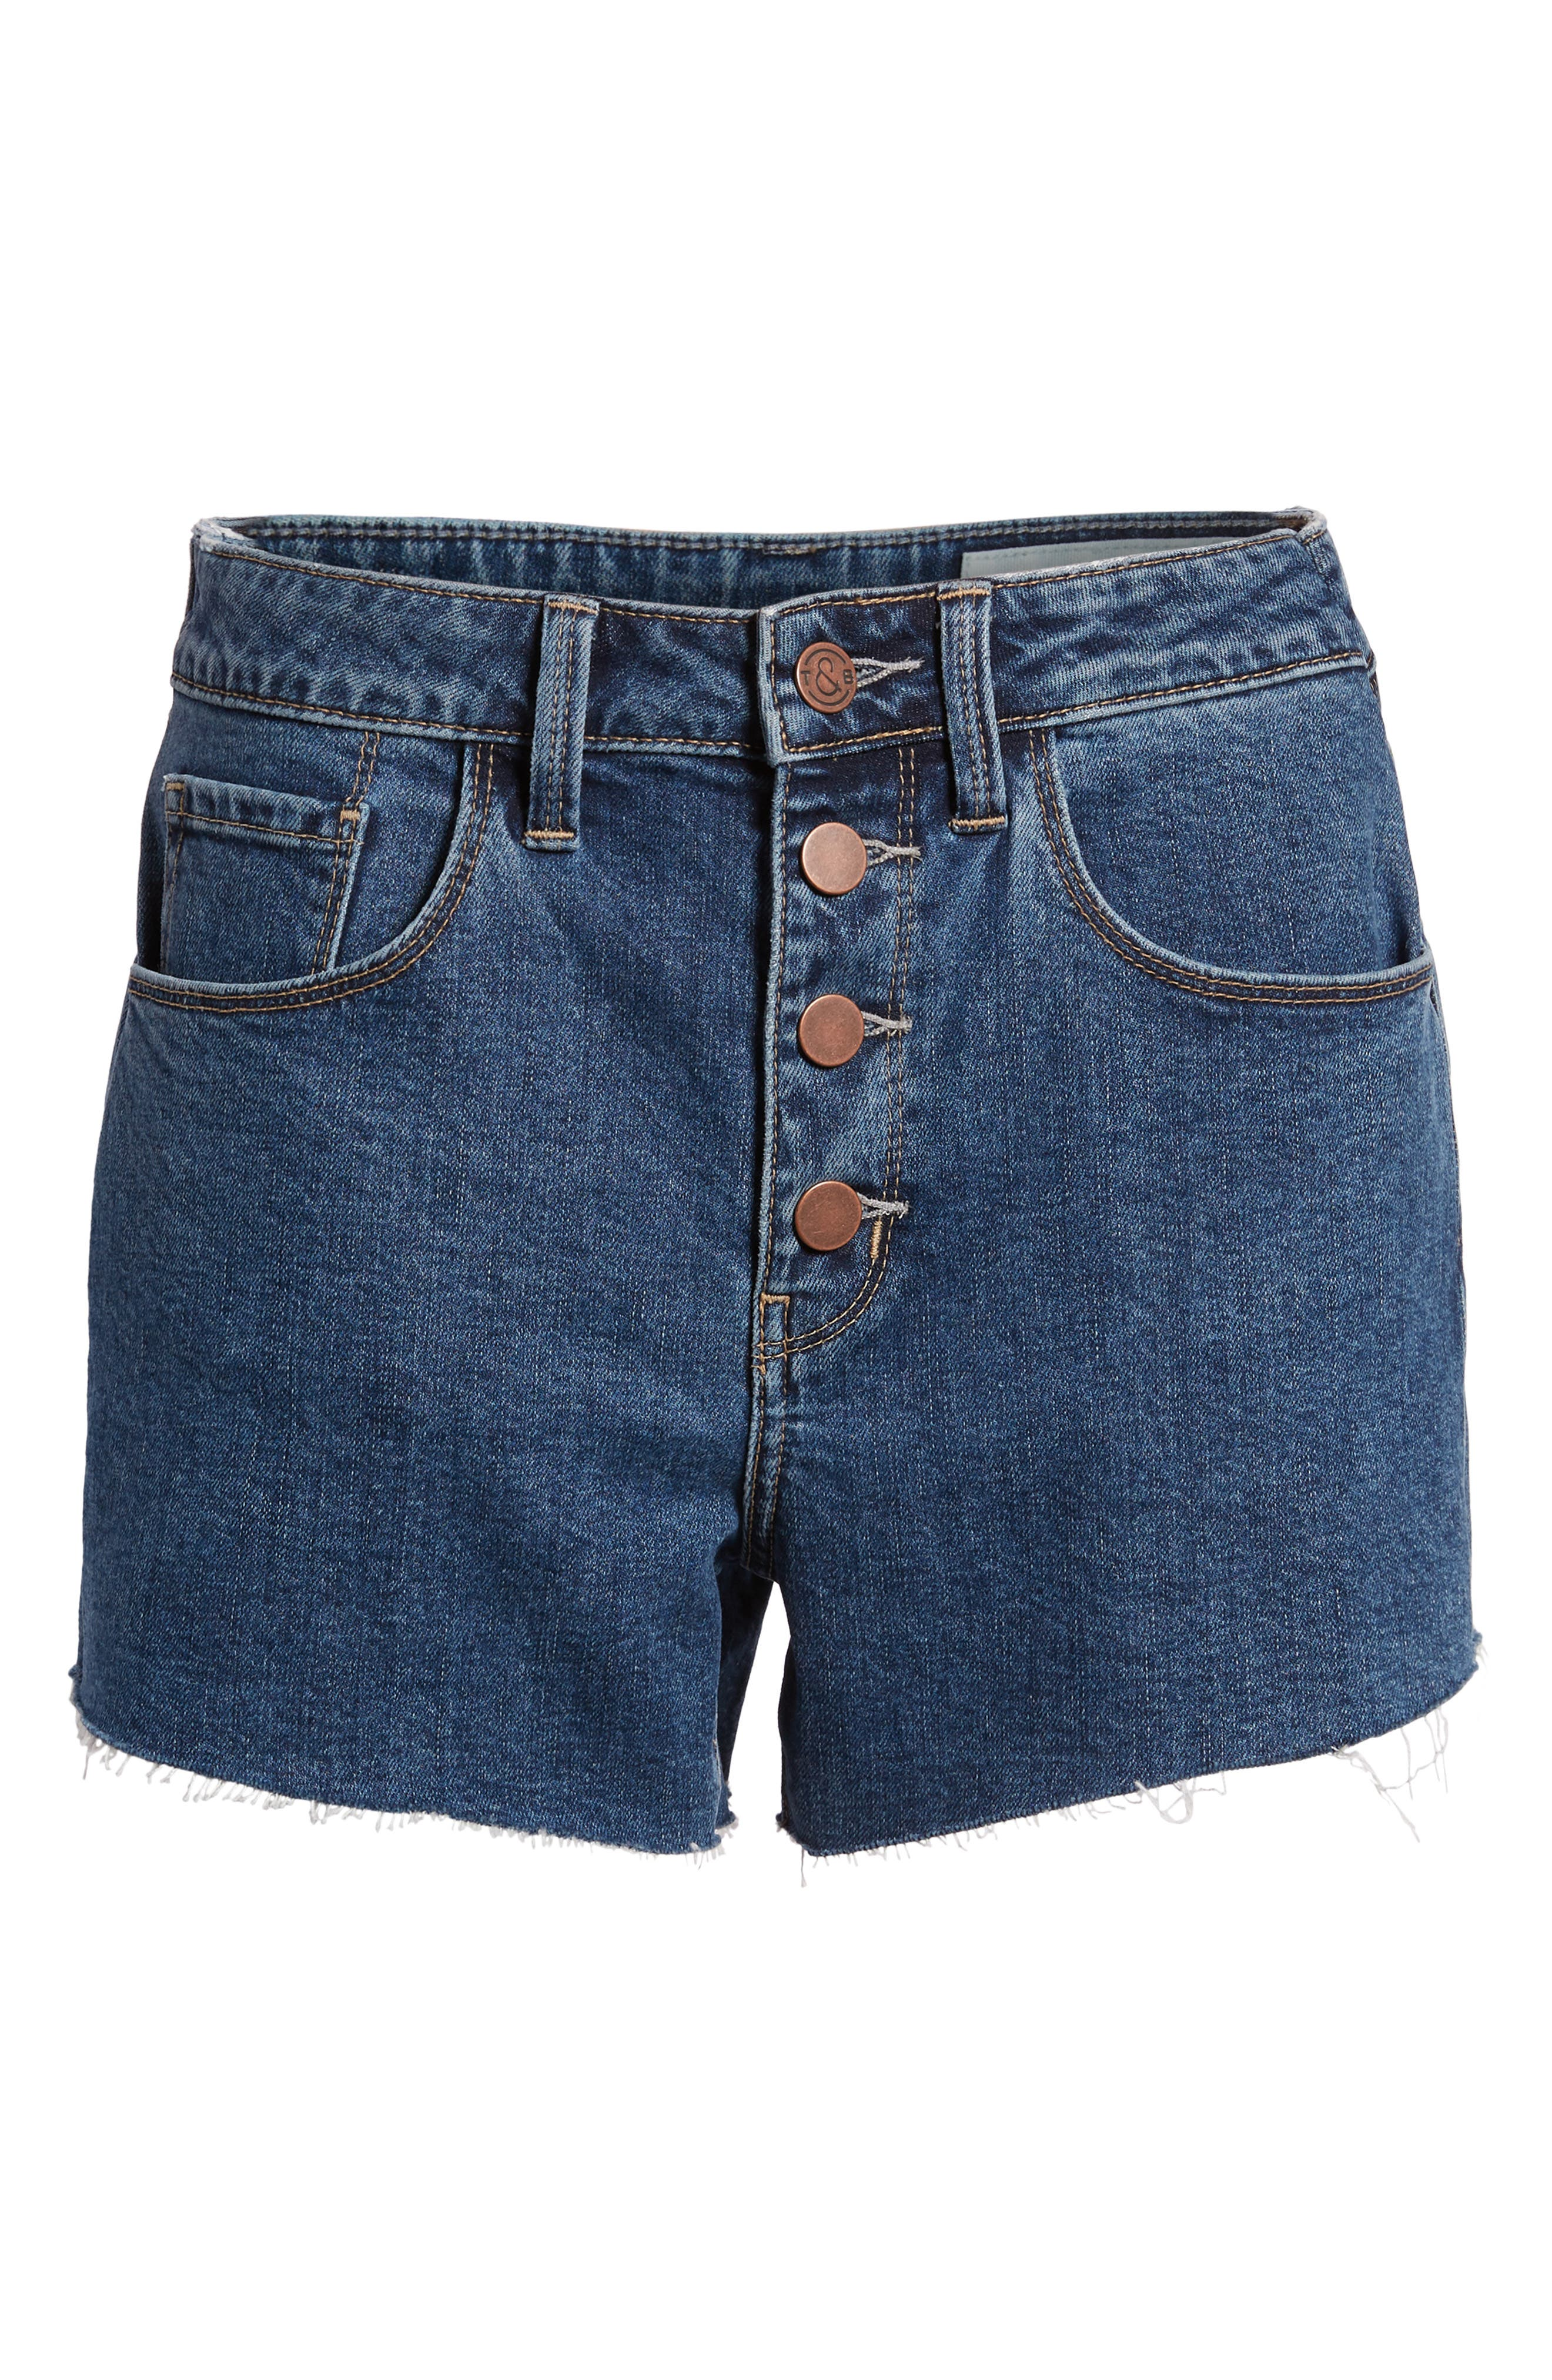 High Waist Cutoff Denim Shorts,                             Alternate thumbnail 7, color,                             400